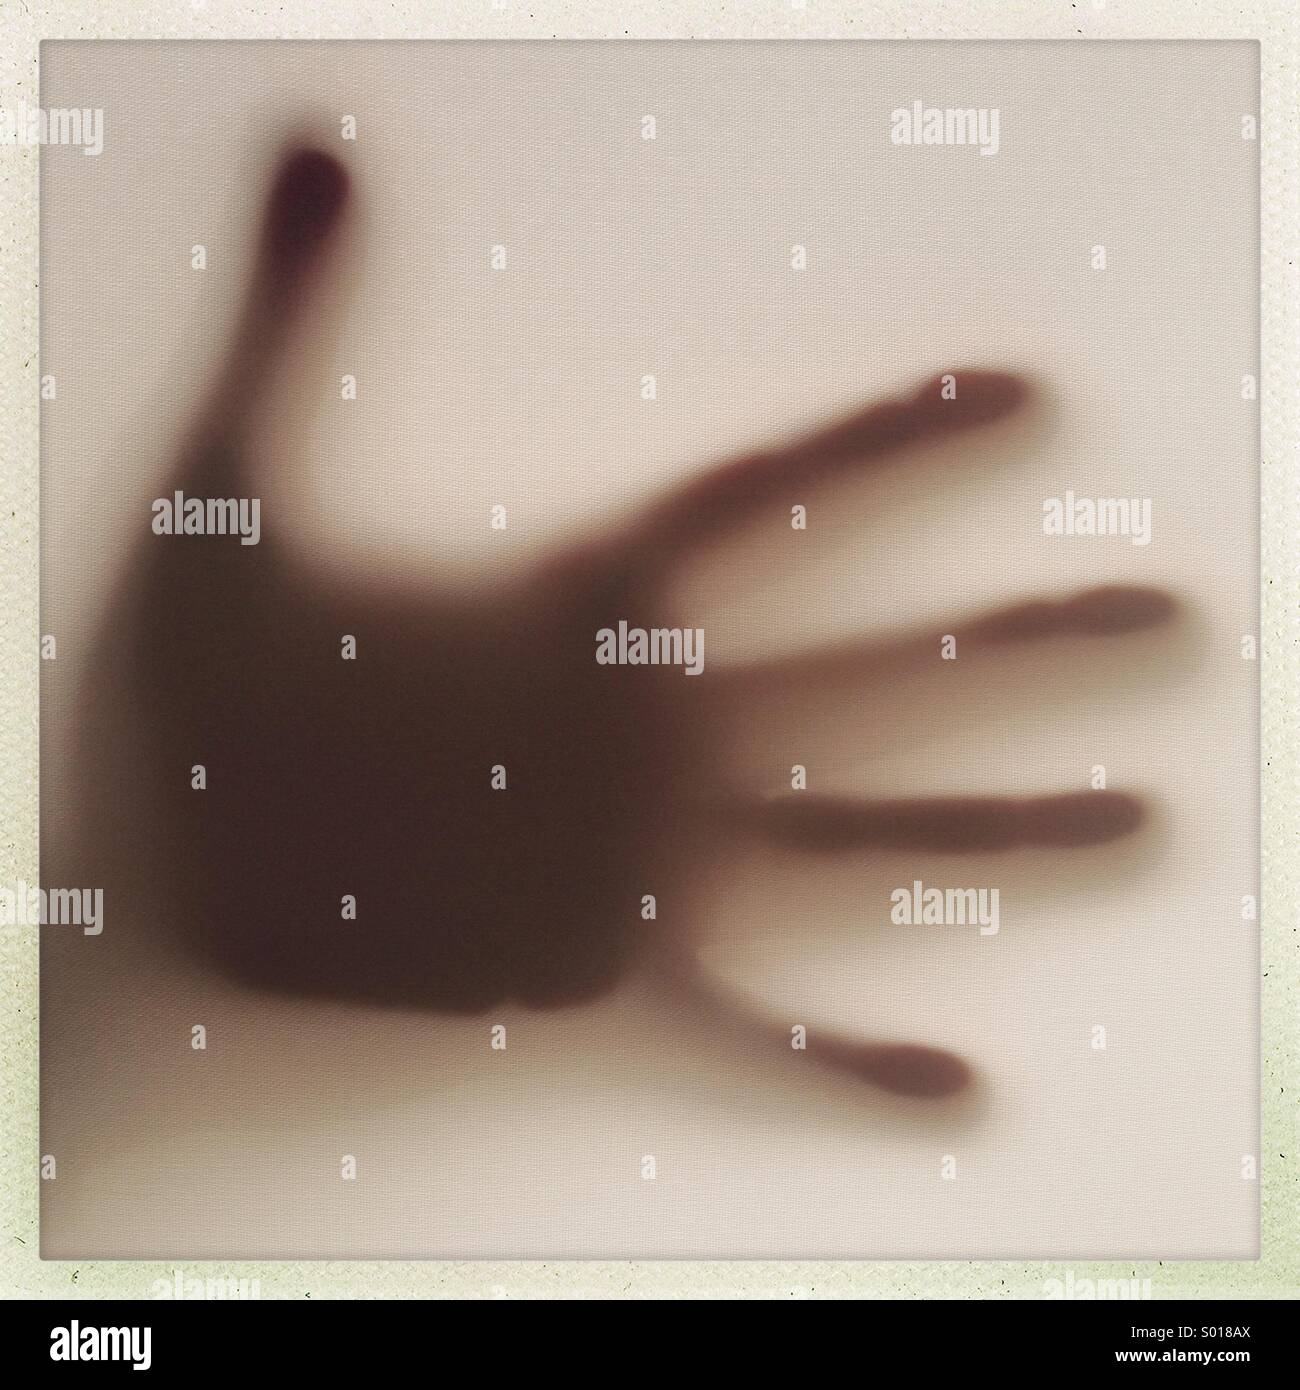 Hand silhoutte on window - Stock Image